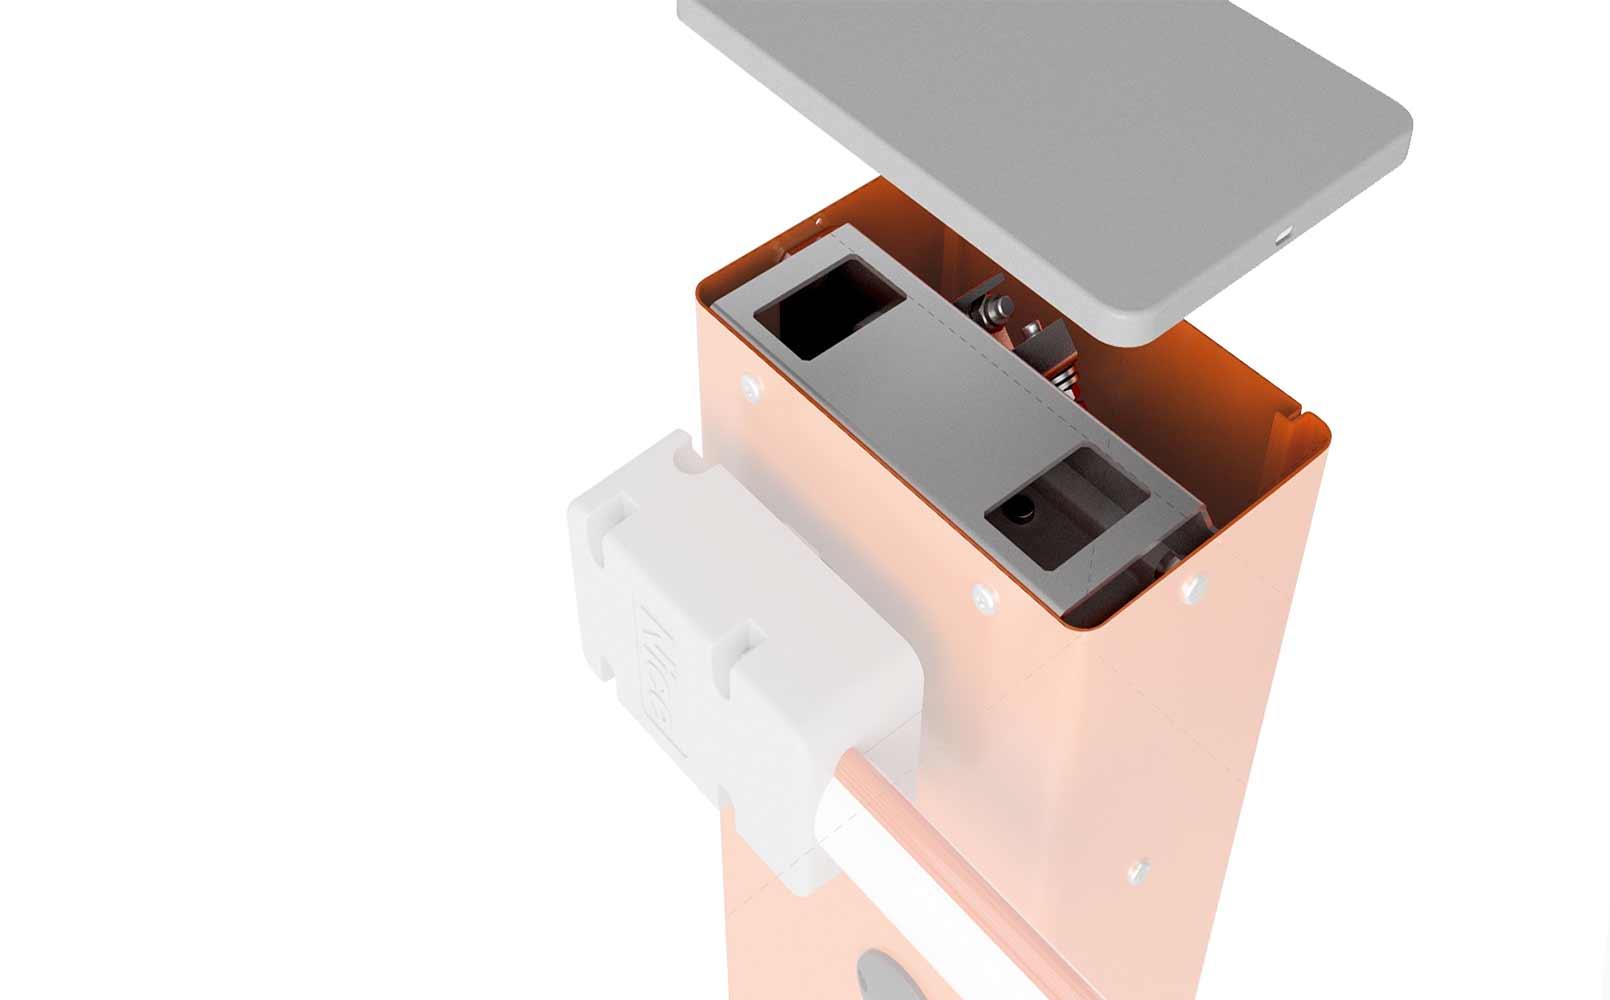 bariera acces auto mecanism interior fara capac